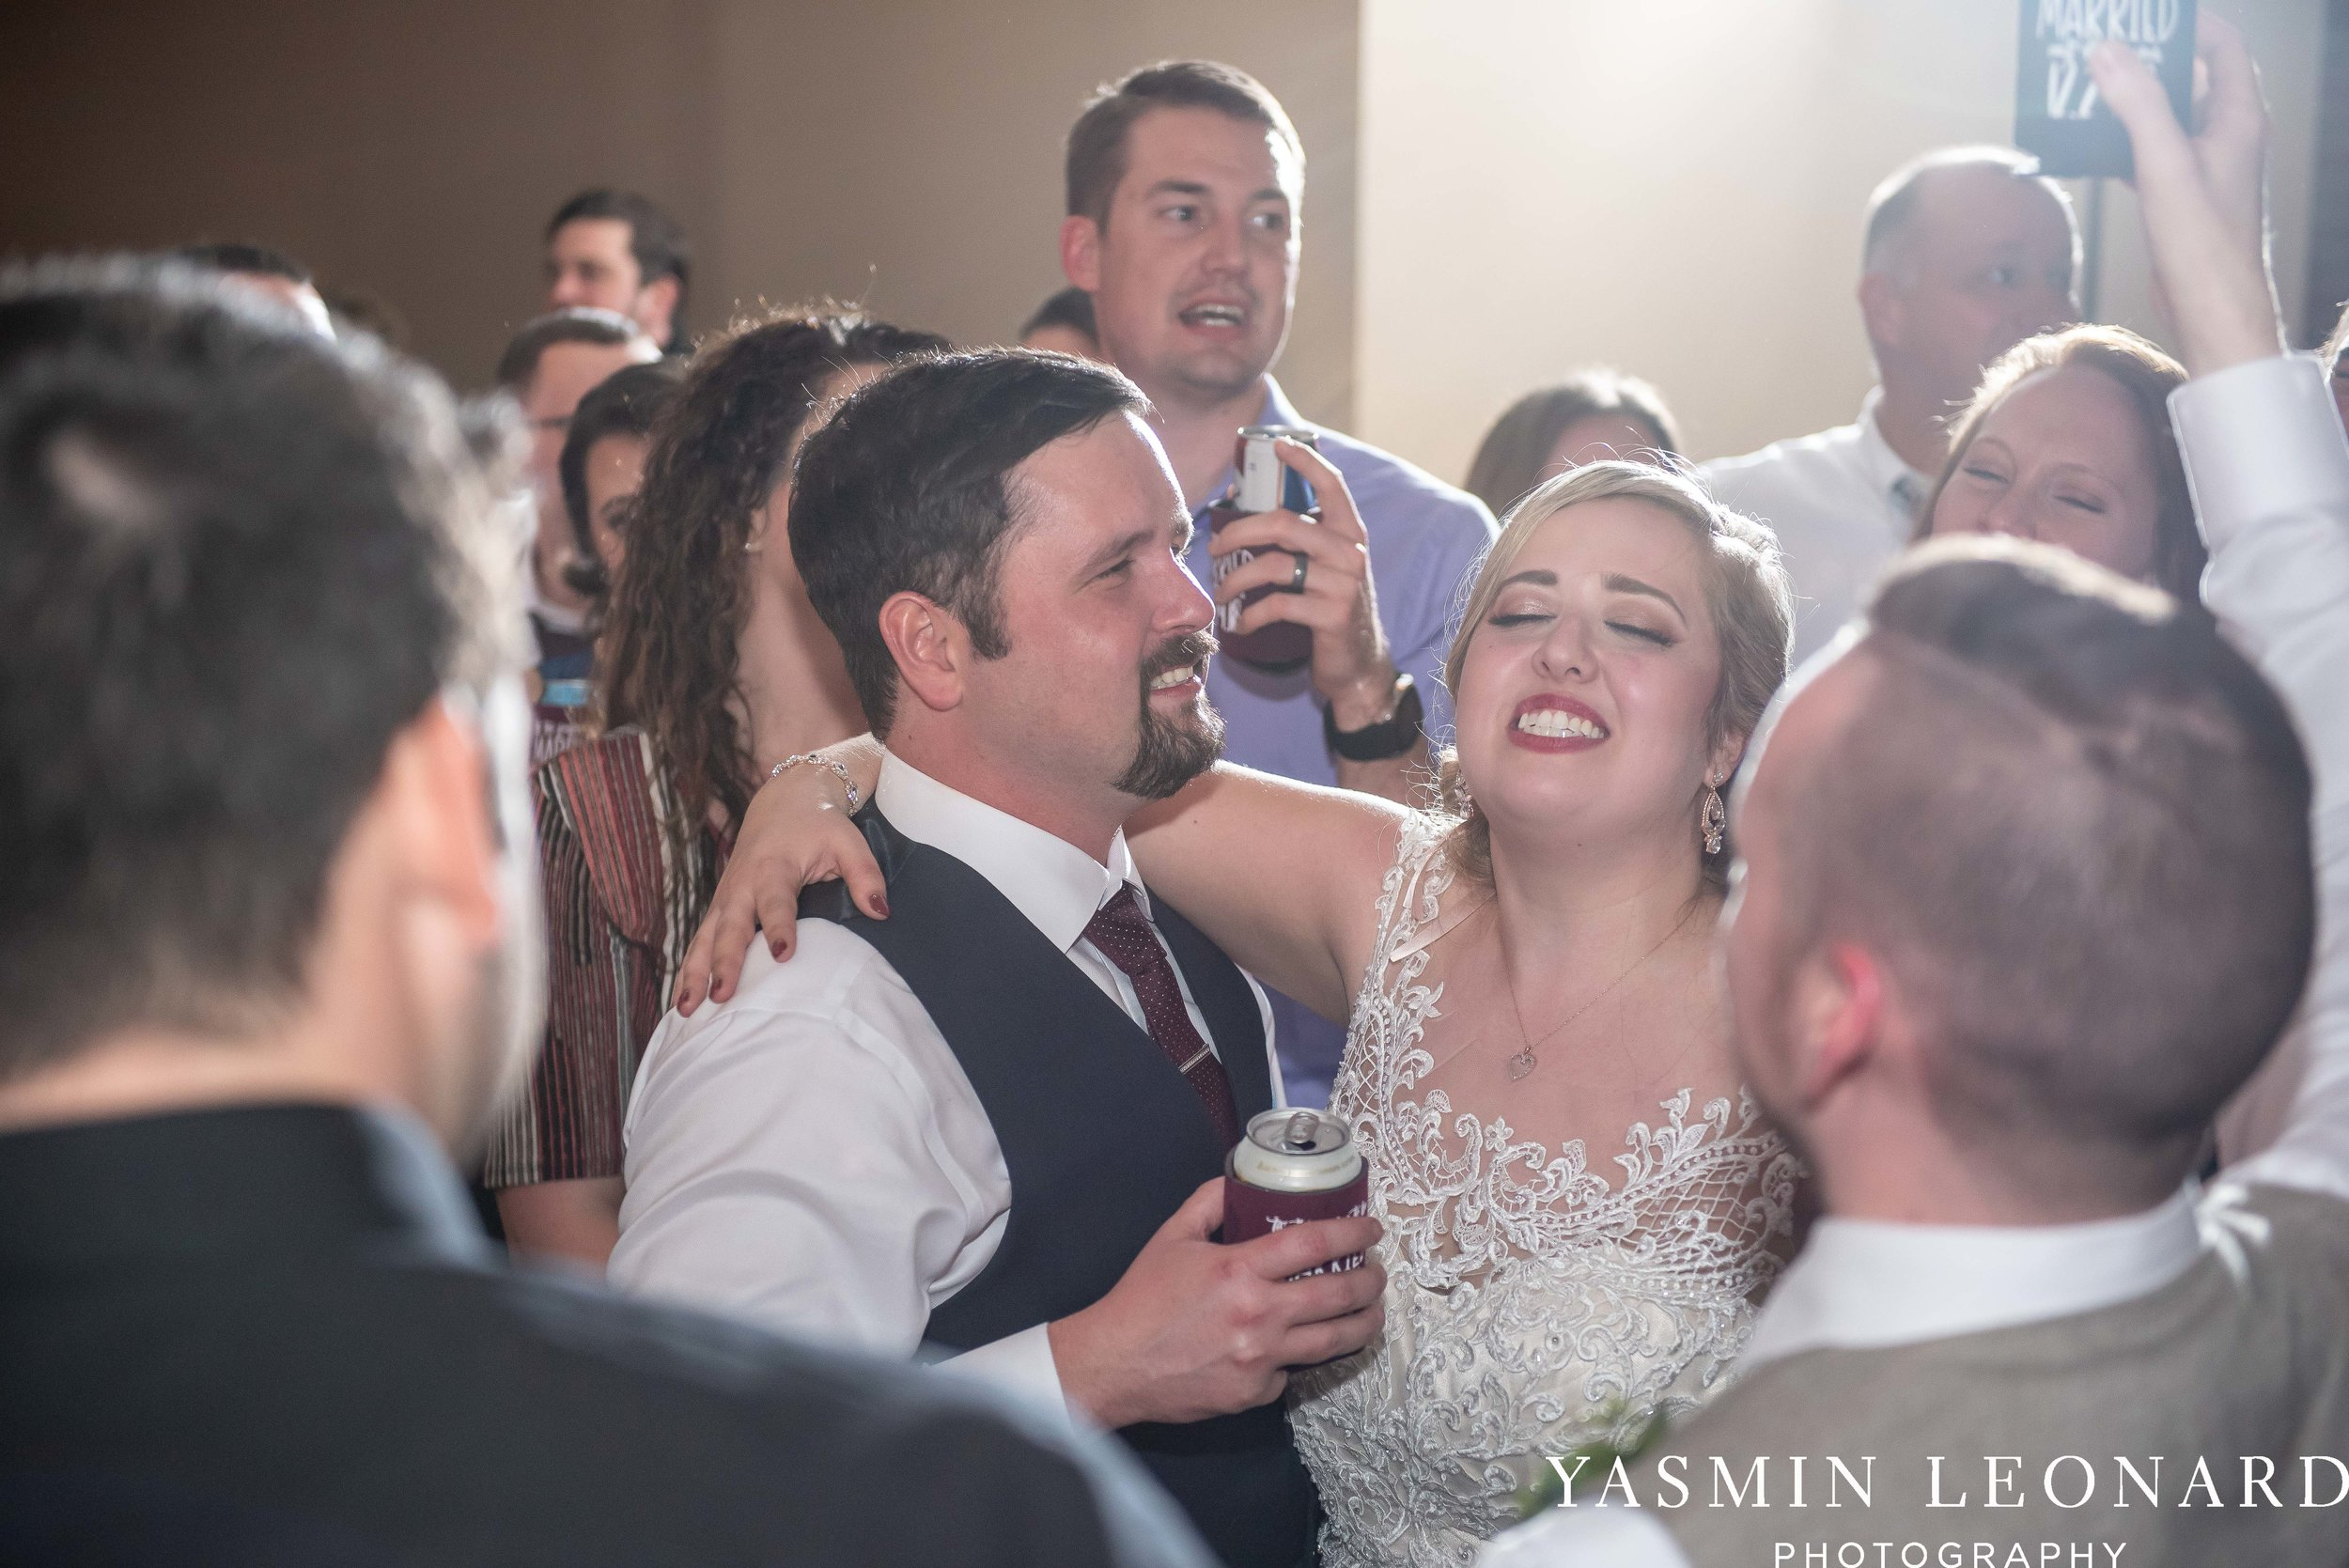 Rebekah and Matt - 105 Worth Event Centre - Yasmin Leonard Photography - Asheboro Wedding - NC Wedding - High Point Weddings - Triad Weddings - Winter Wedding-76.jpg